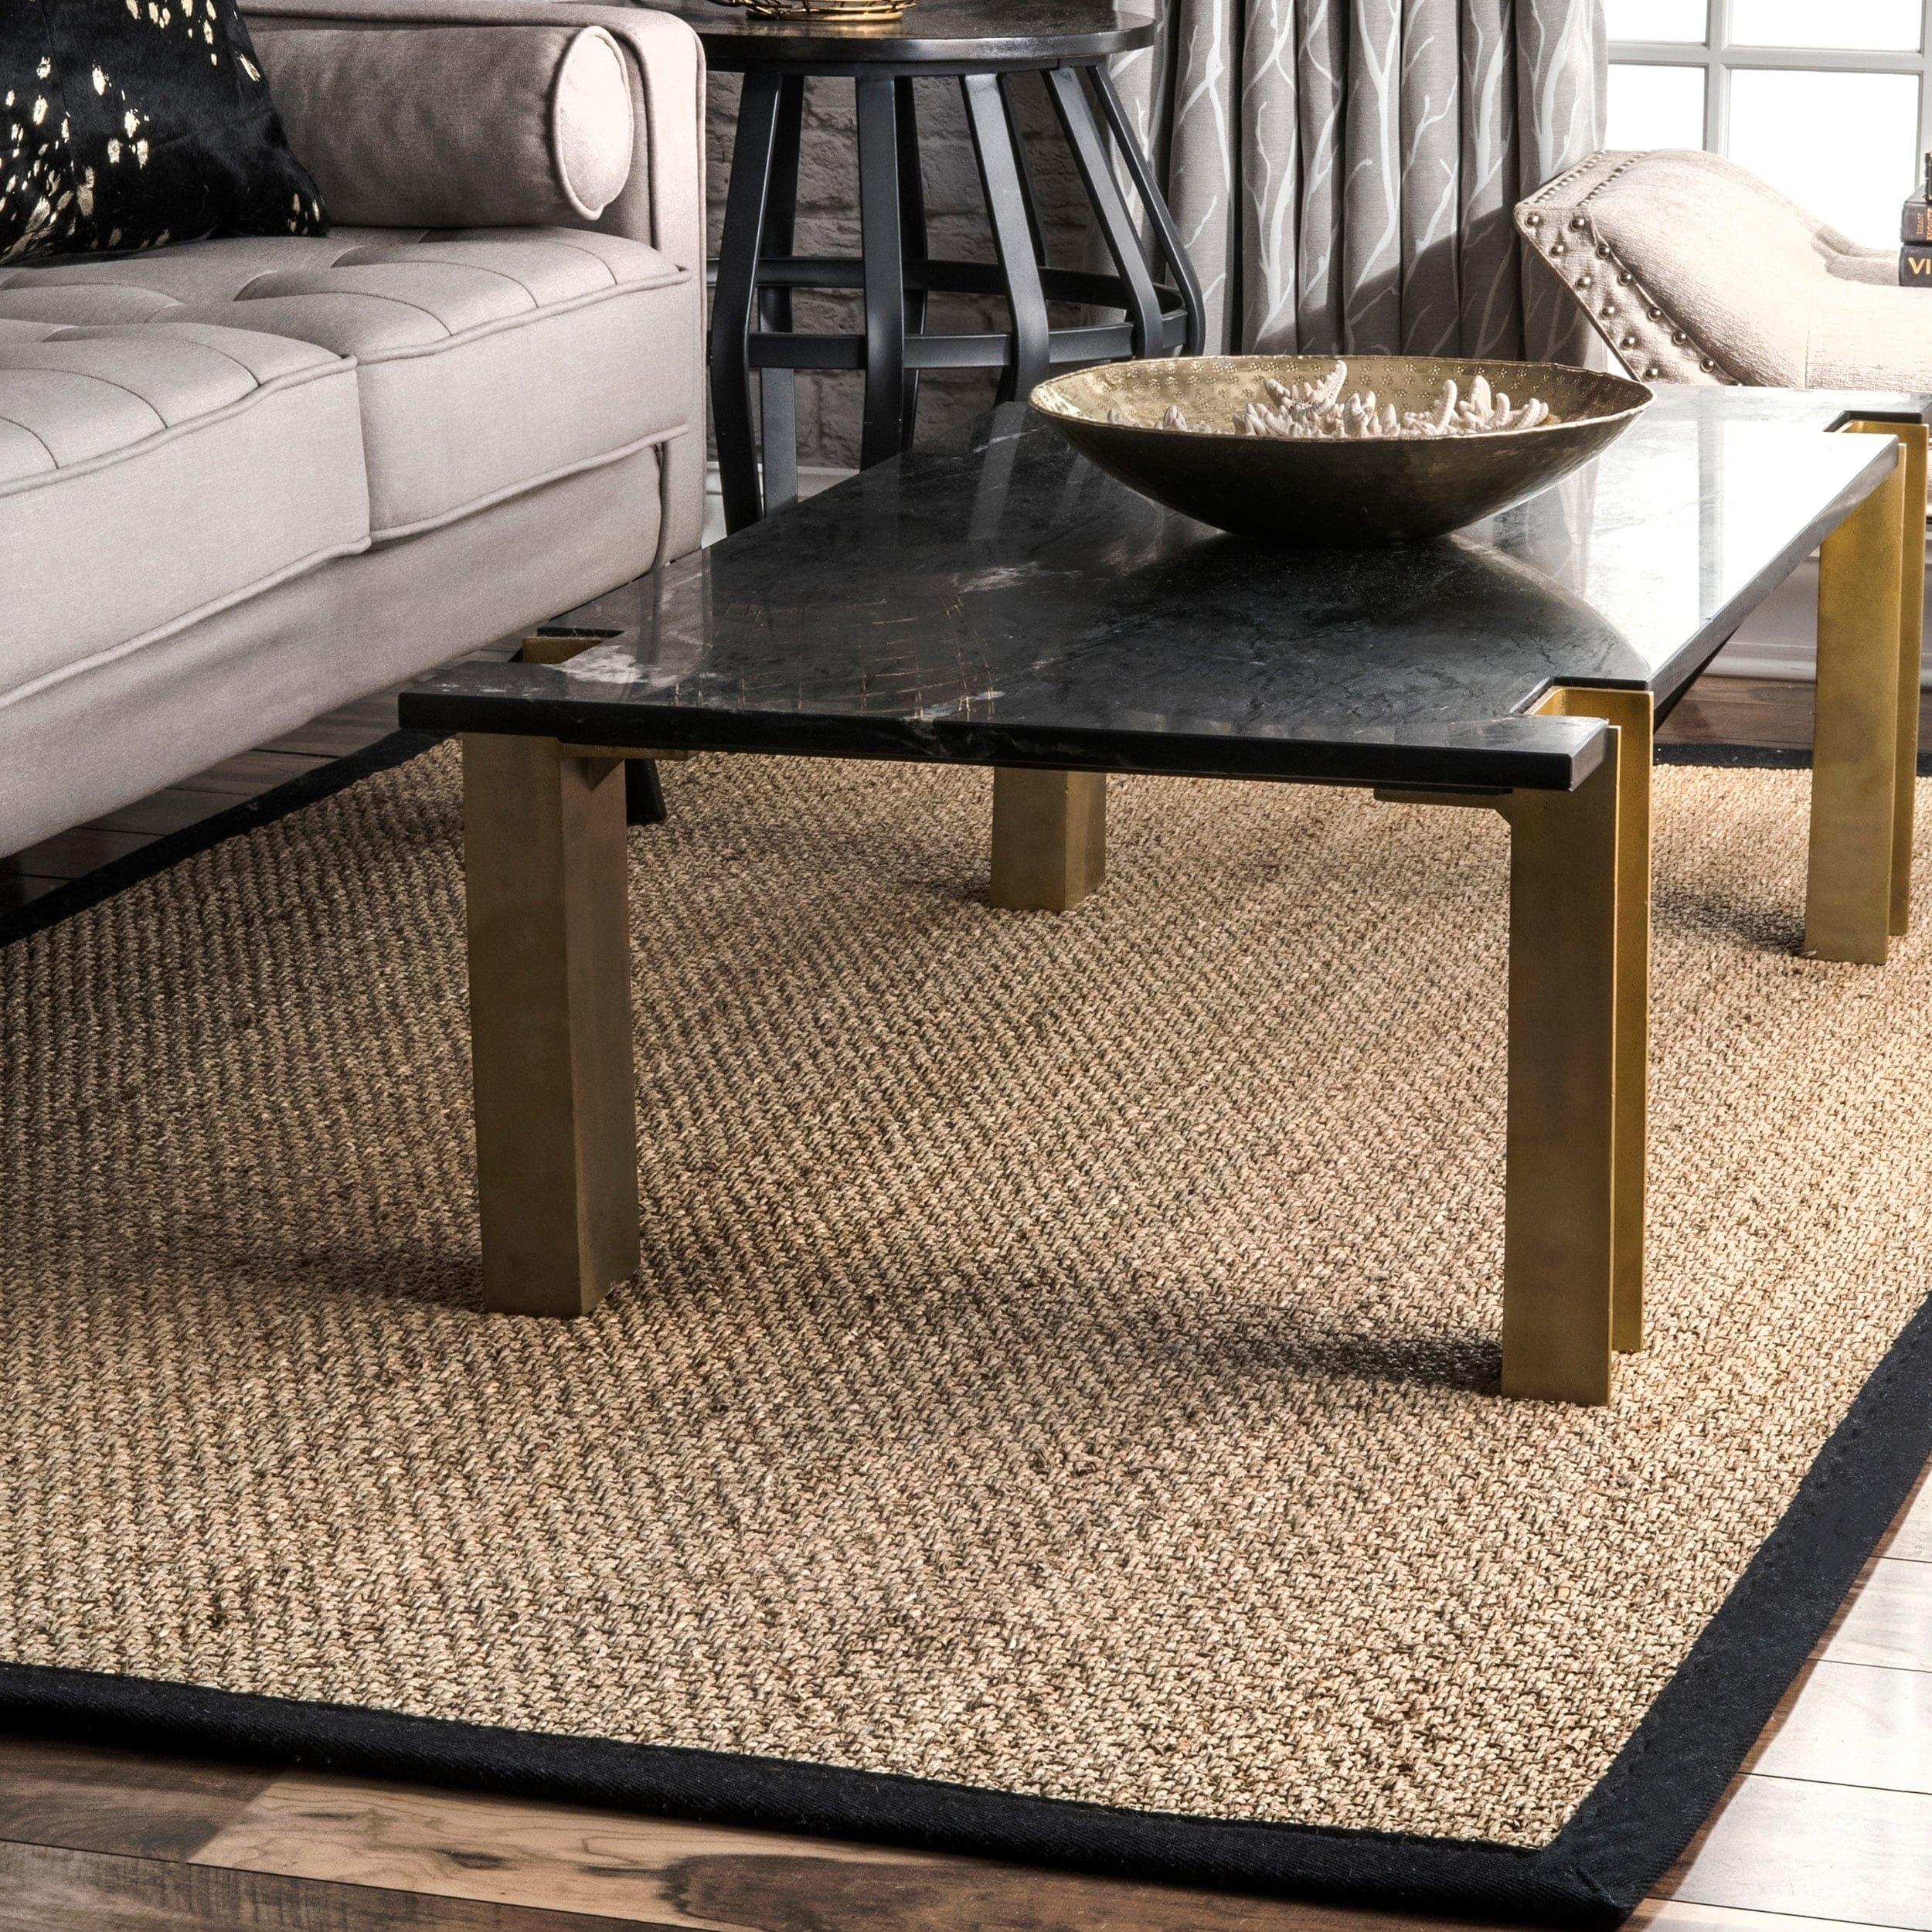 Cotton Handmade Accent Furniture